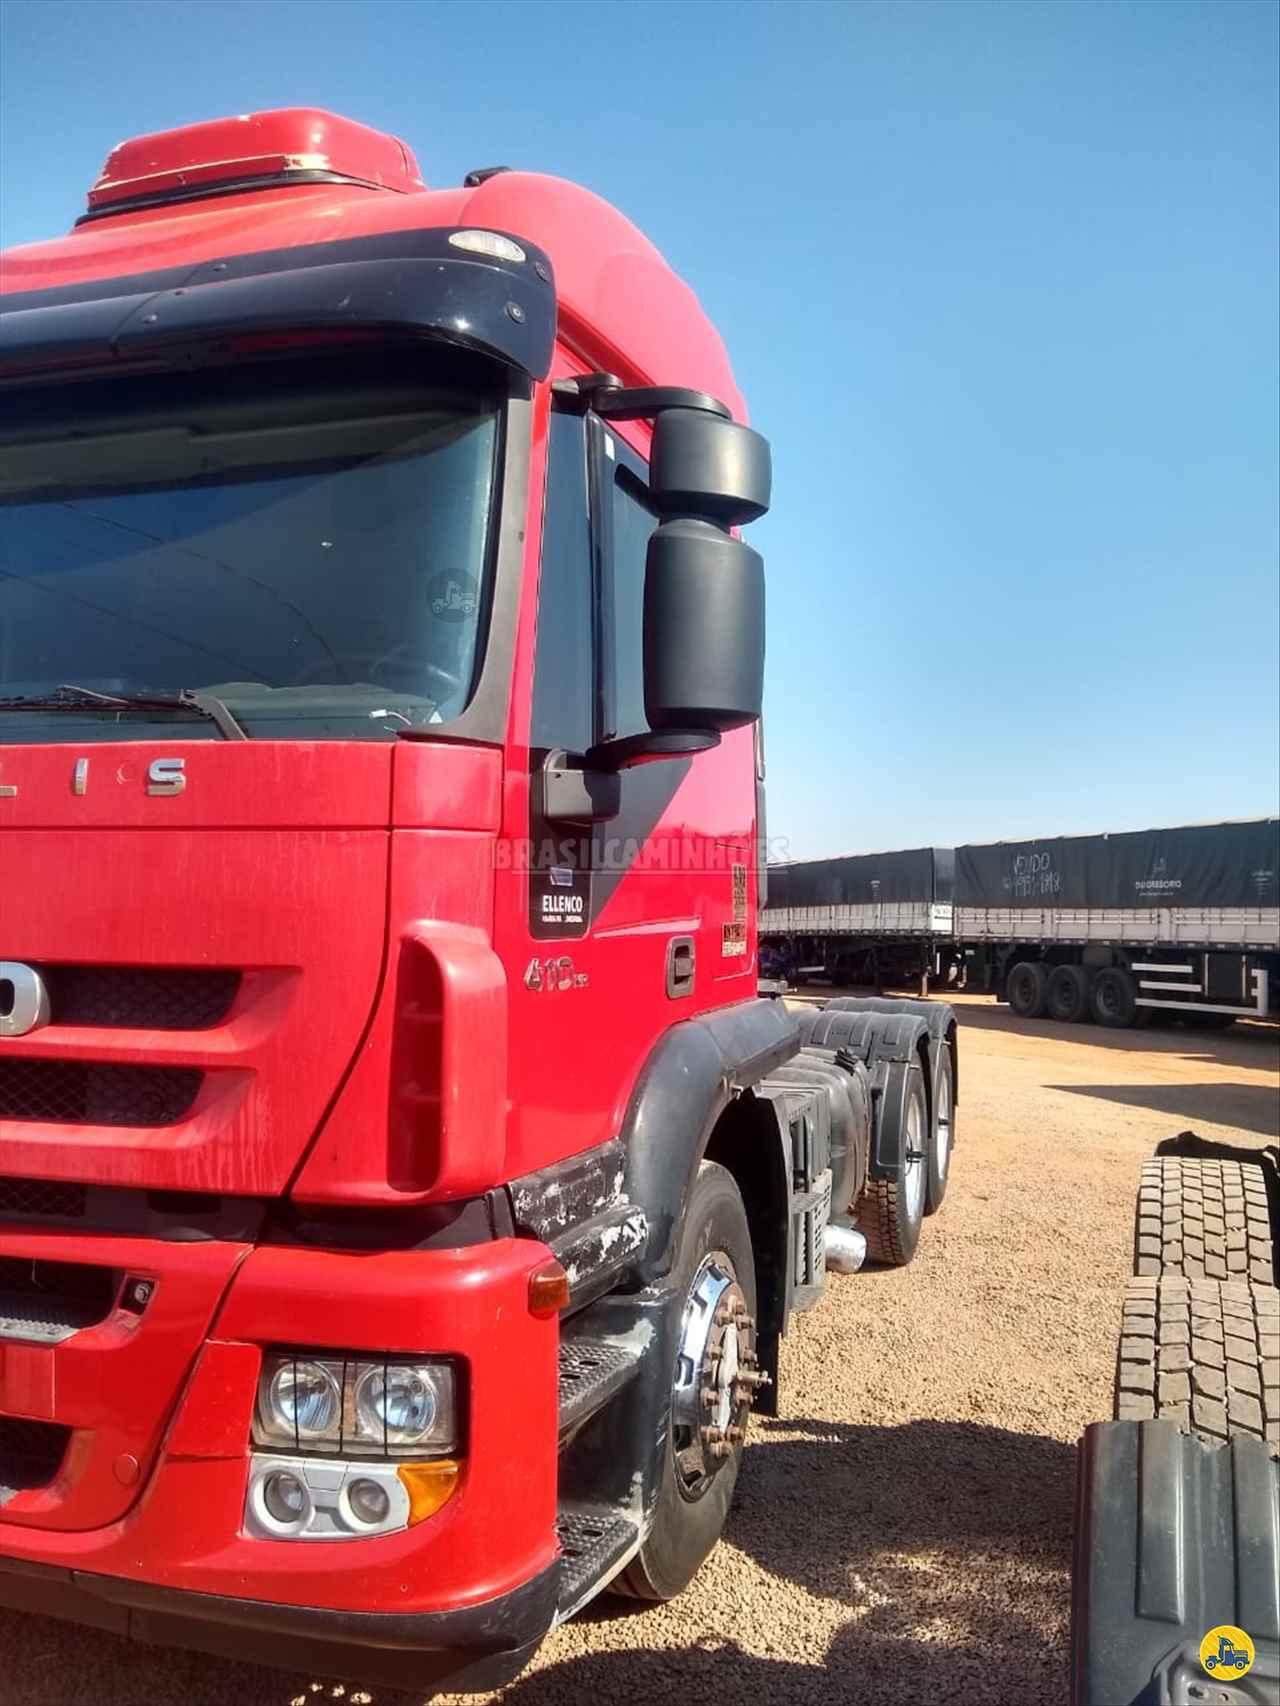 CAMINHAO IVECO STRALIS 570 Cavalo Mecânico Truck 6x2 Brasil Caminhões Sinop SINOP MATO GROSSO MT